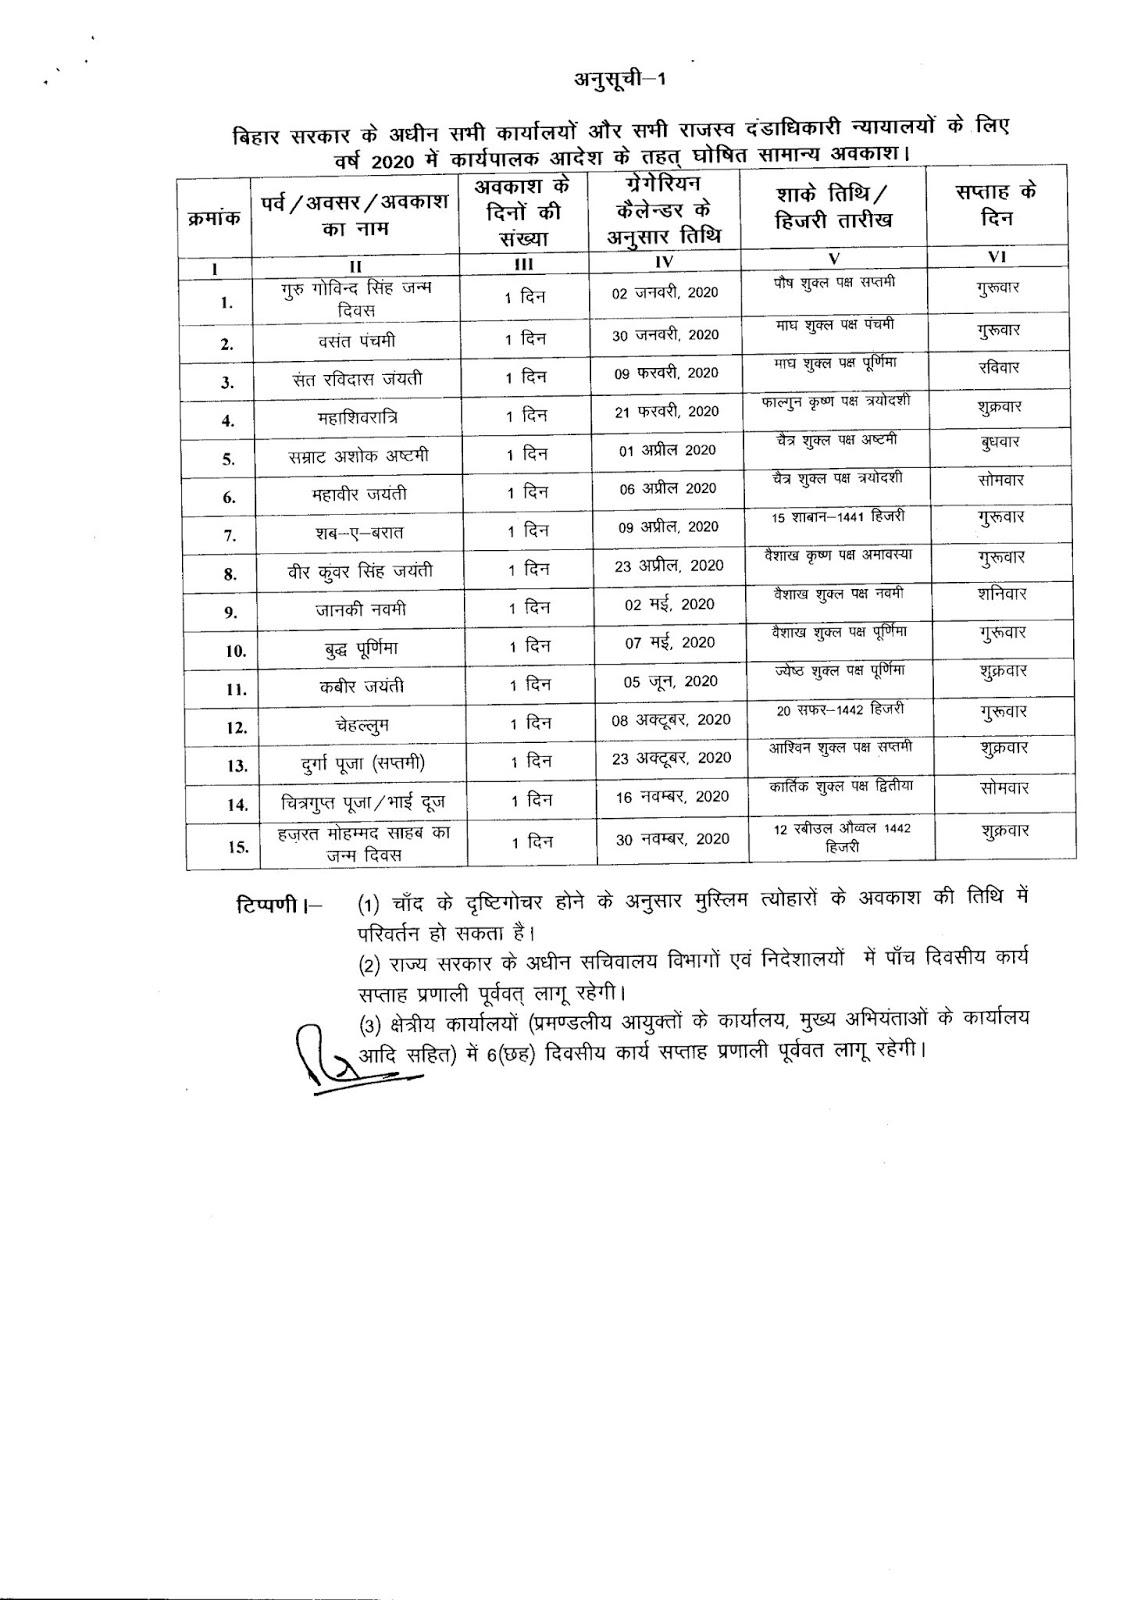 Bihar Government Calendar 2020 #educratsweb with Bihar Govt Calendar 2020 Pdf